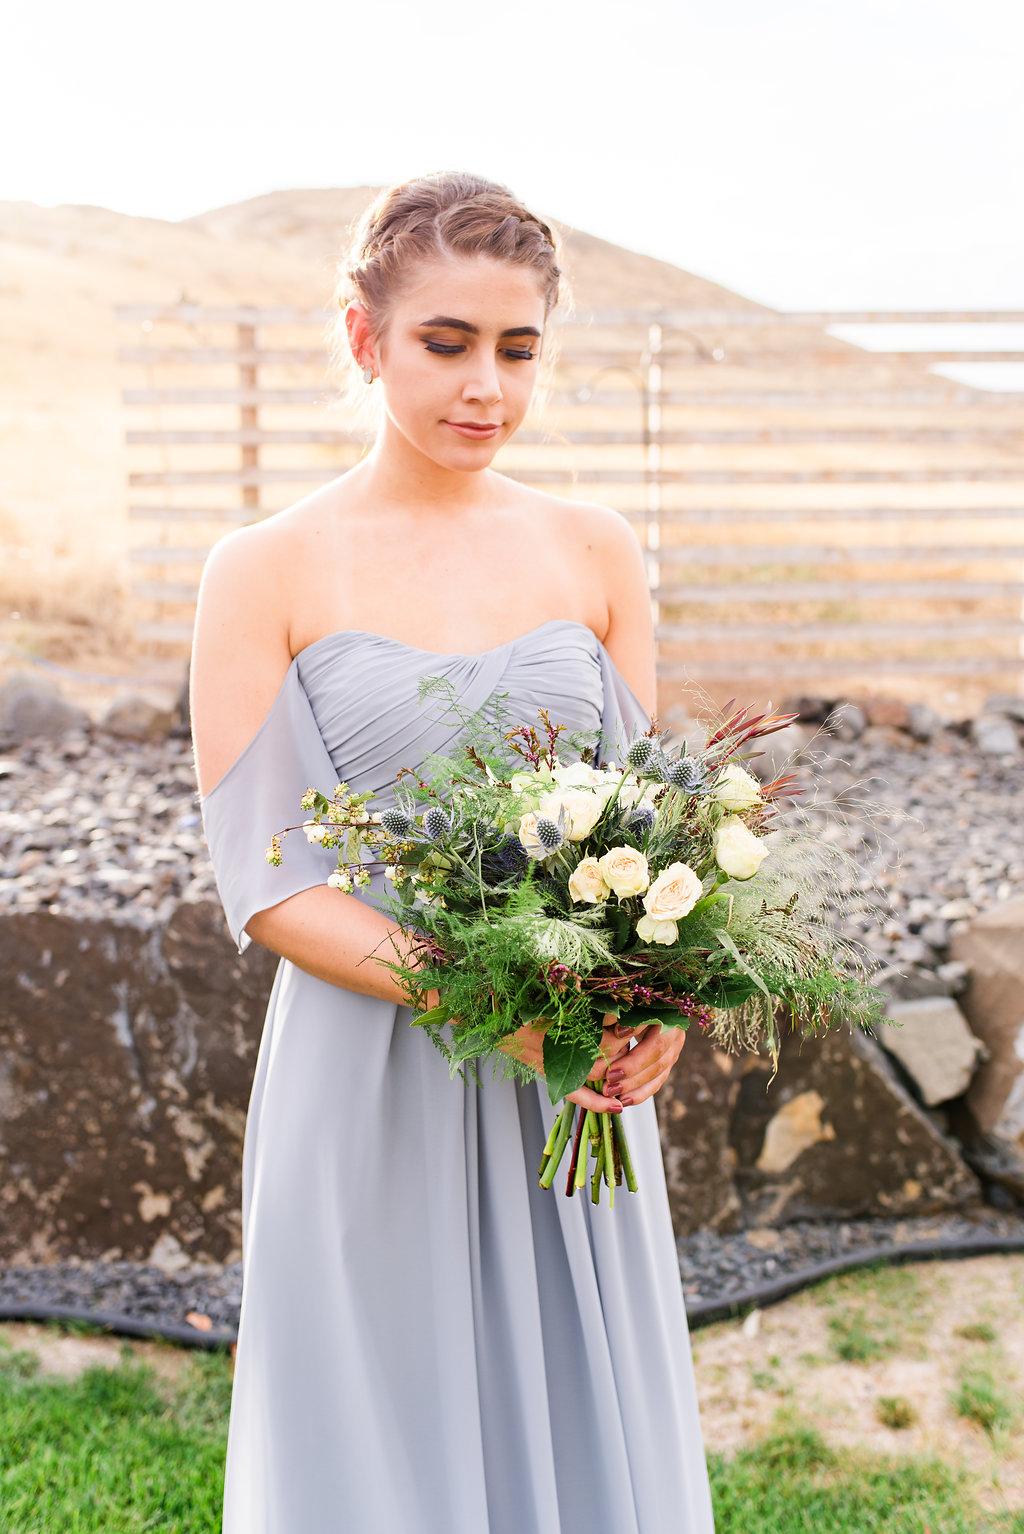 509Bride_the 509 Bride_Morgan Tayler Photo and design_tri cities photographer_14